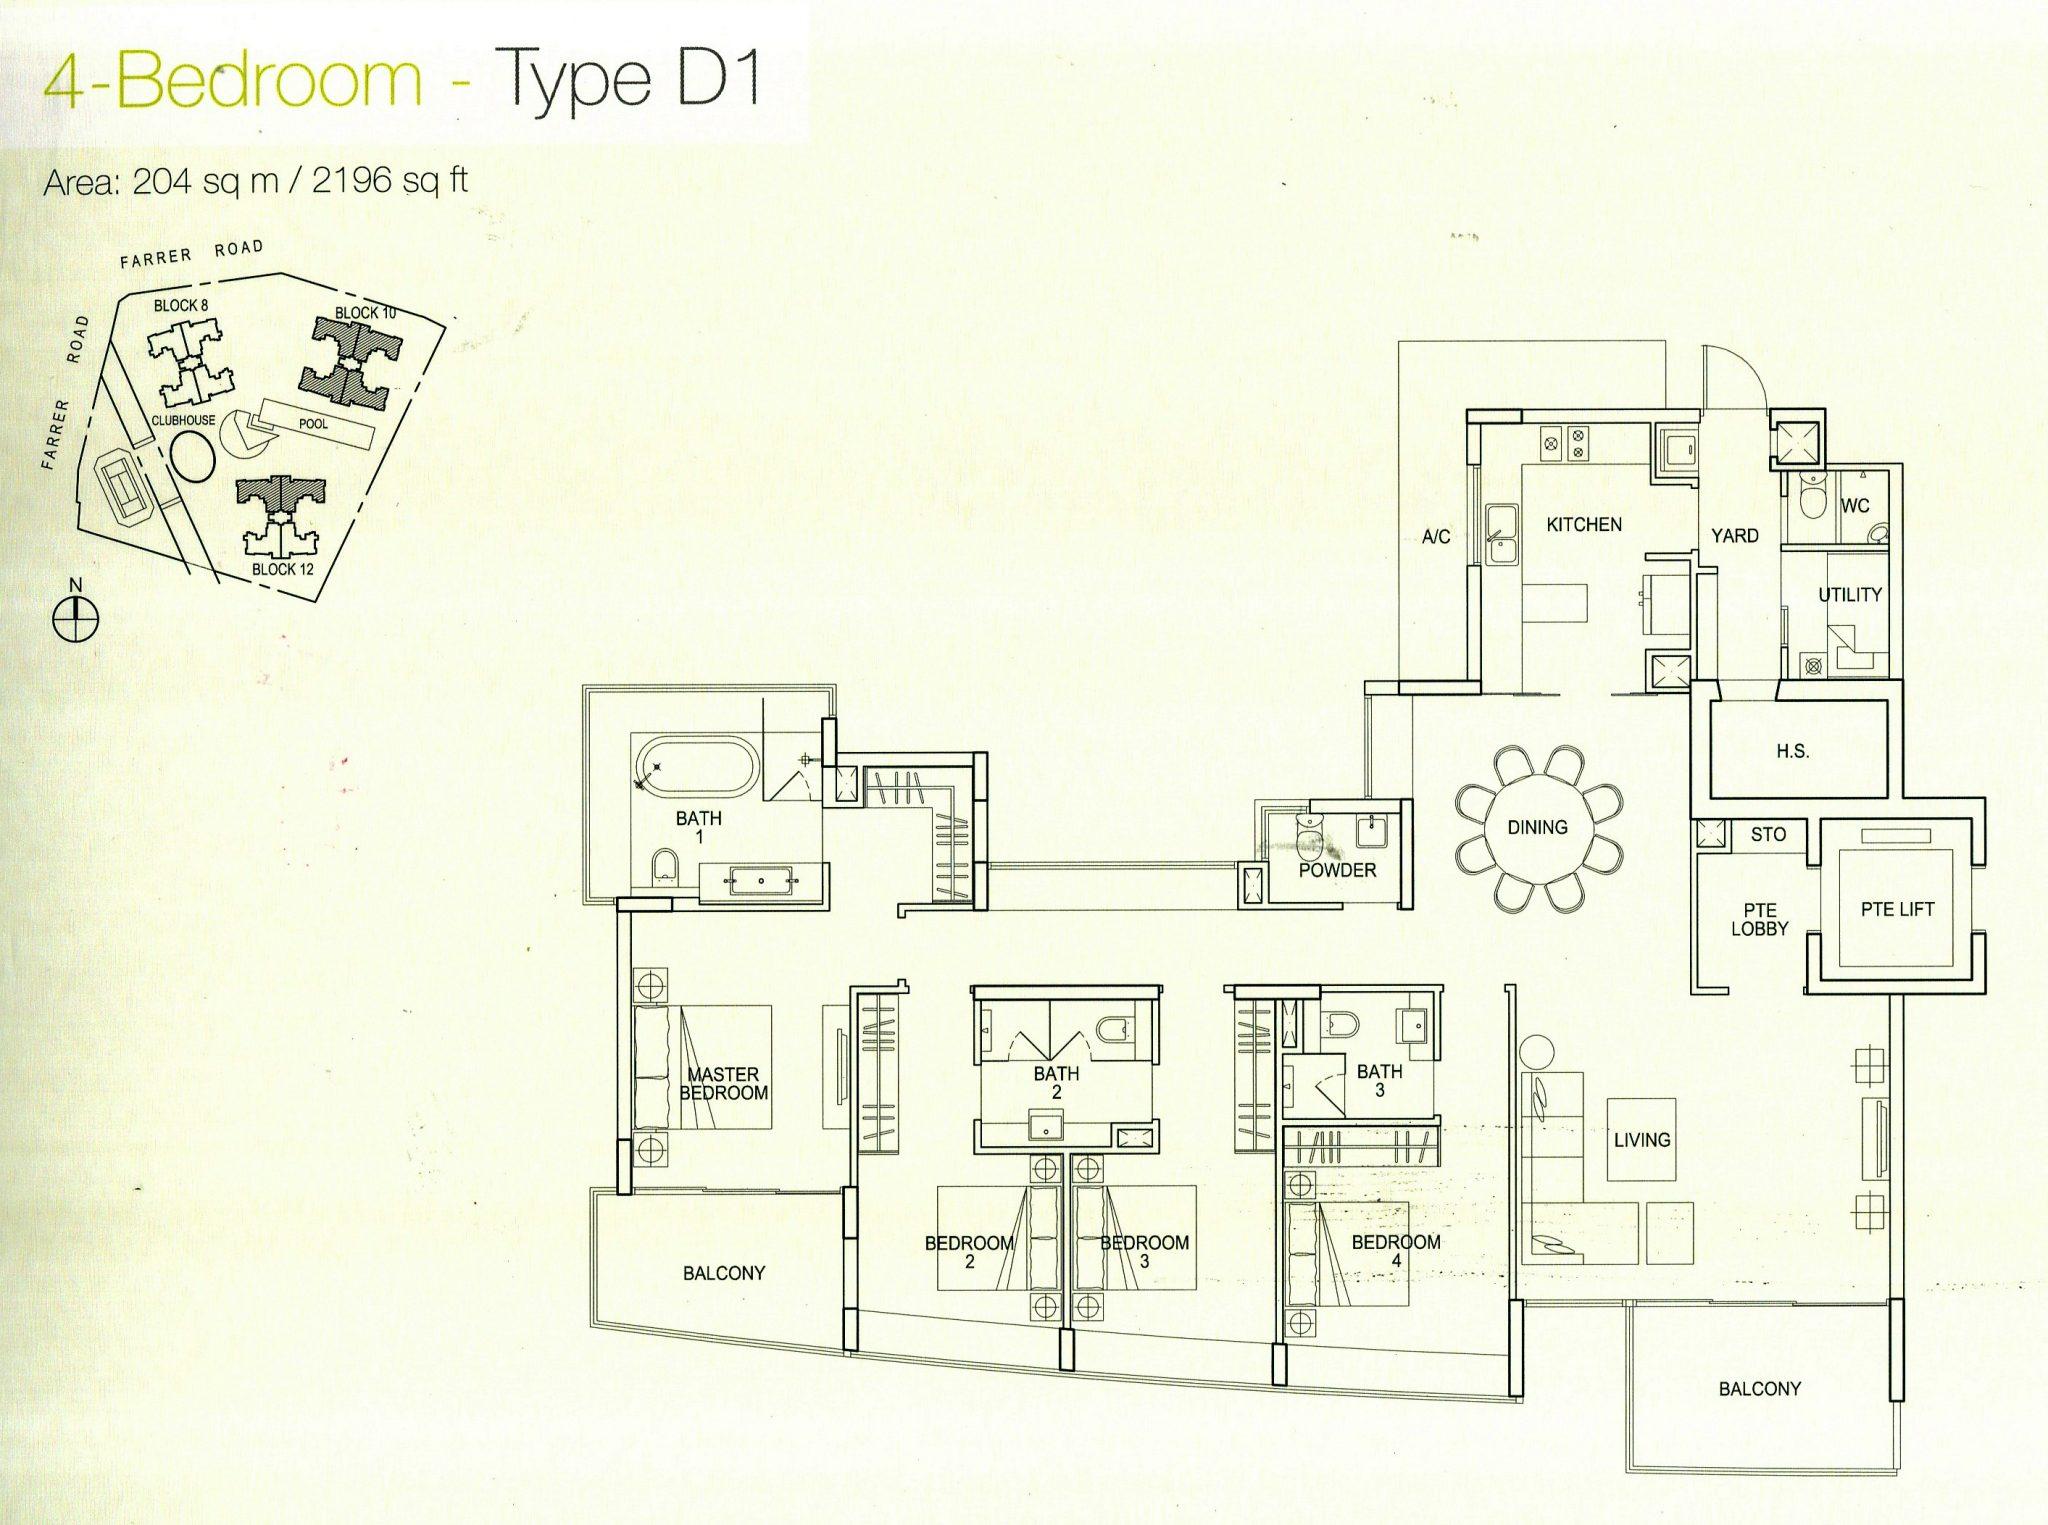 waterfall gardens floorplan | Shinoken & Hecks Pte Ltd